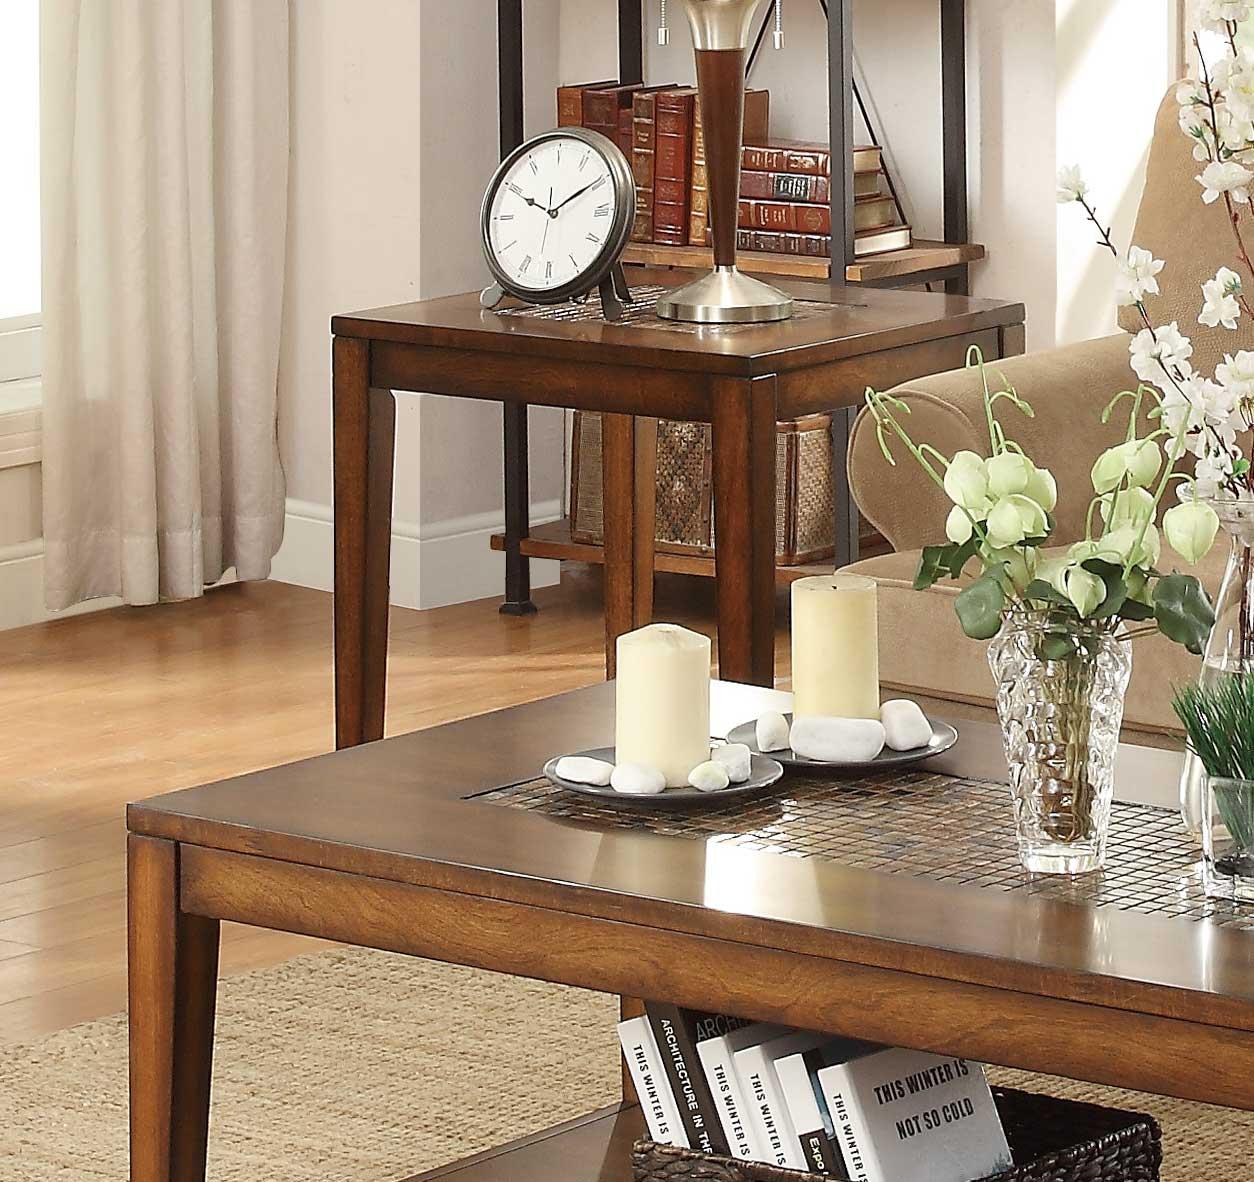 Homelegance Antoni End Table with Shelf - Warm Brown Cherry